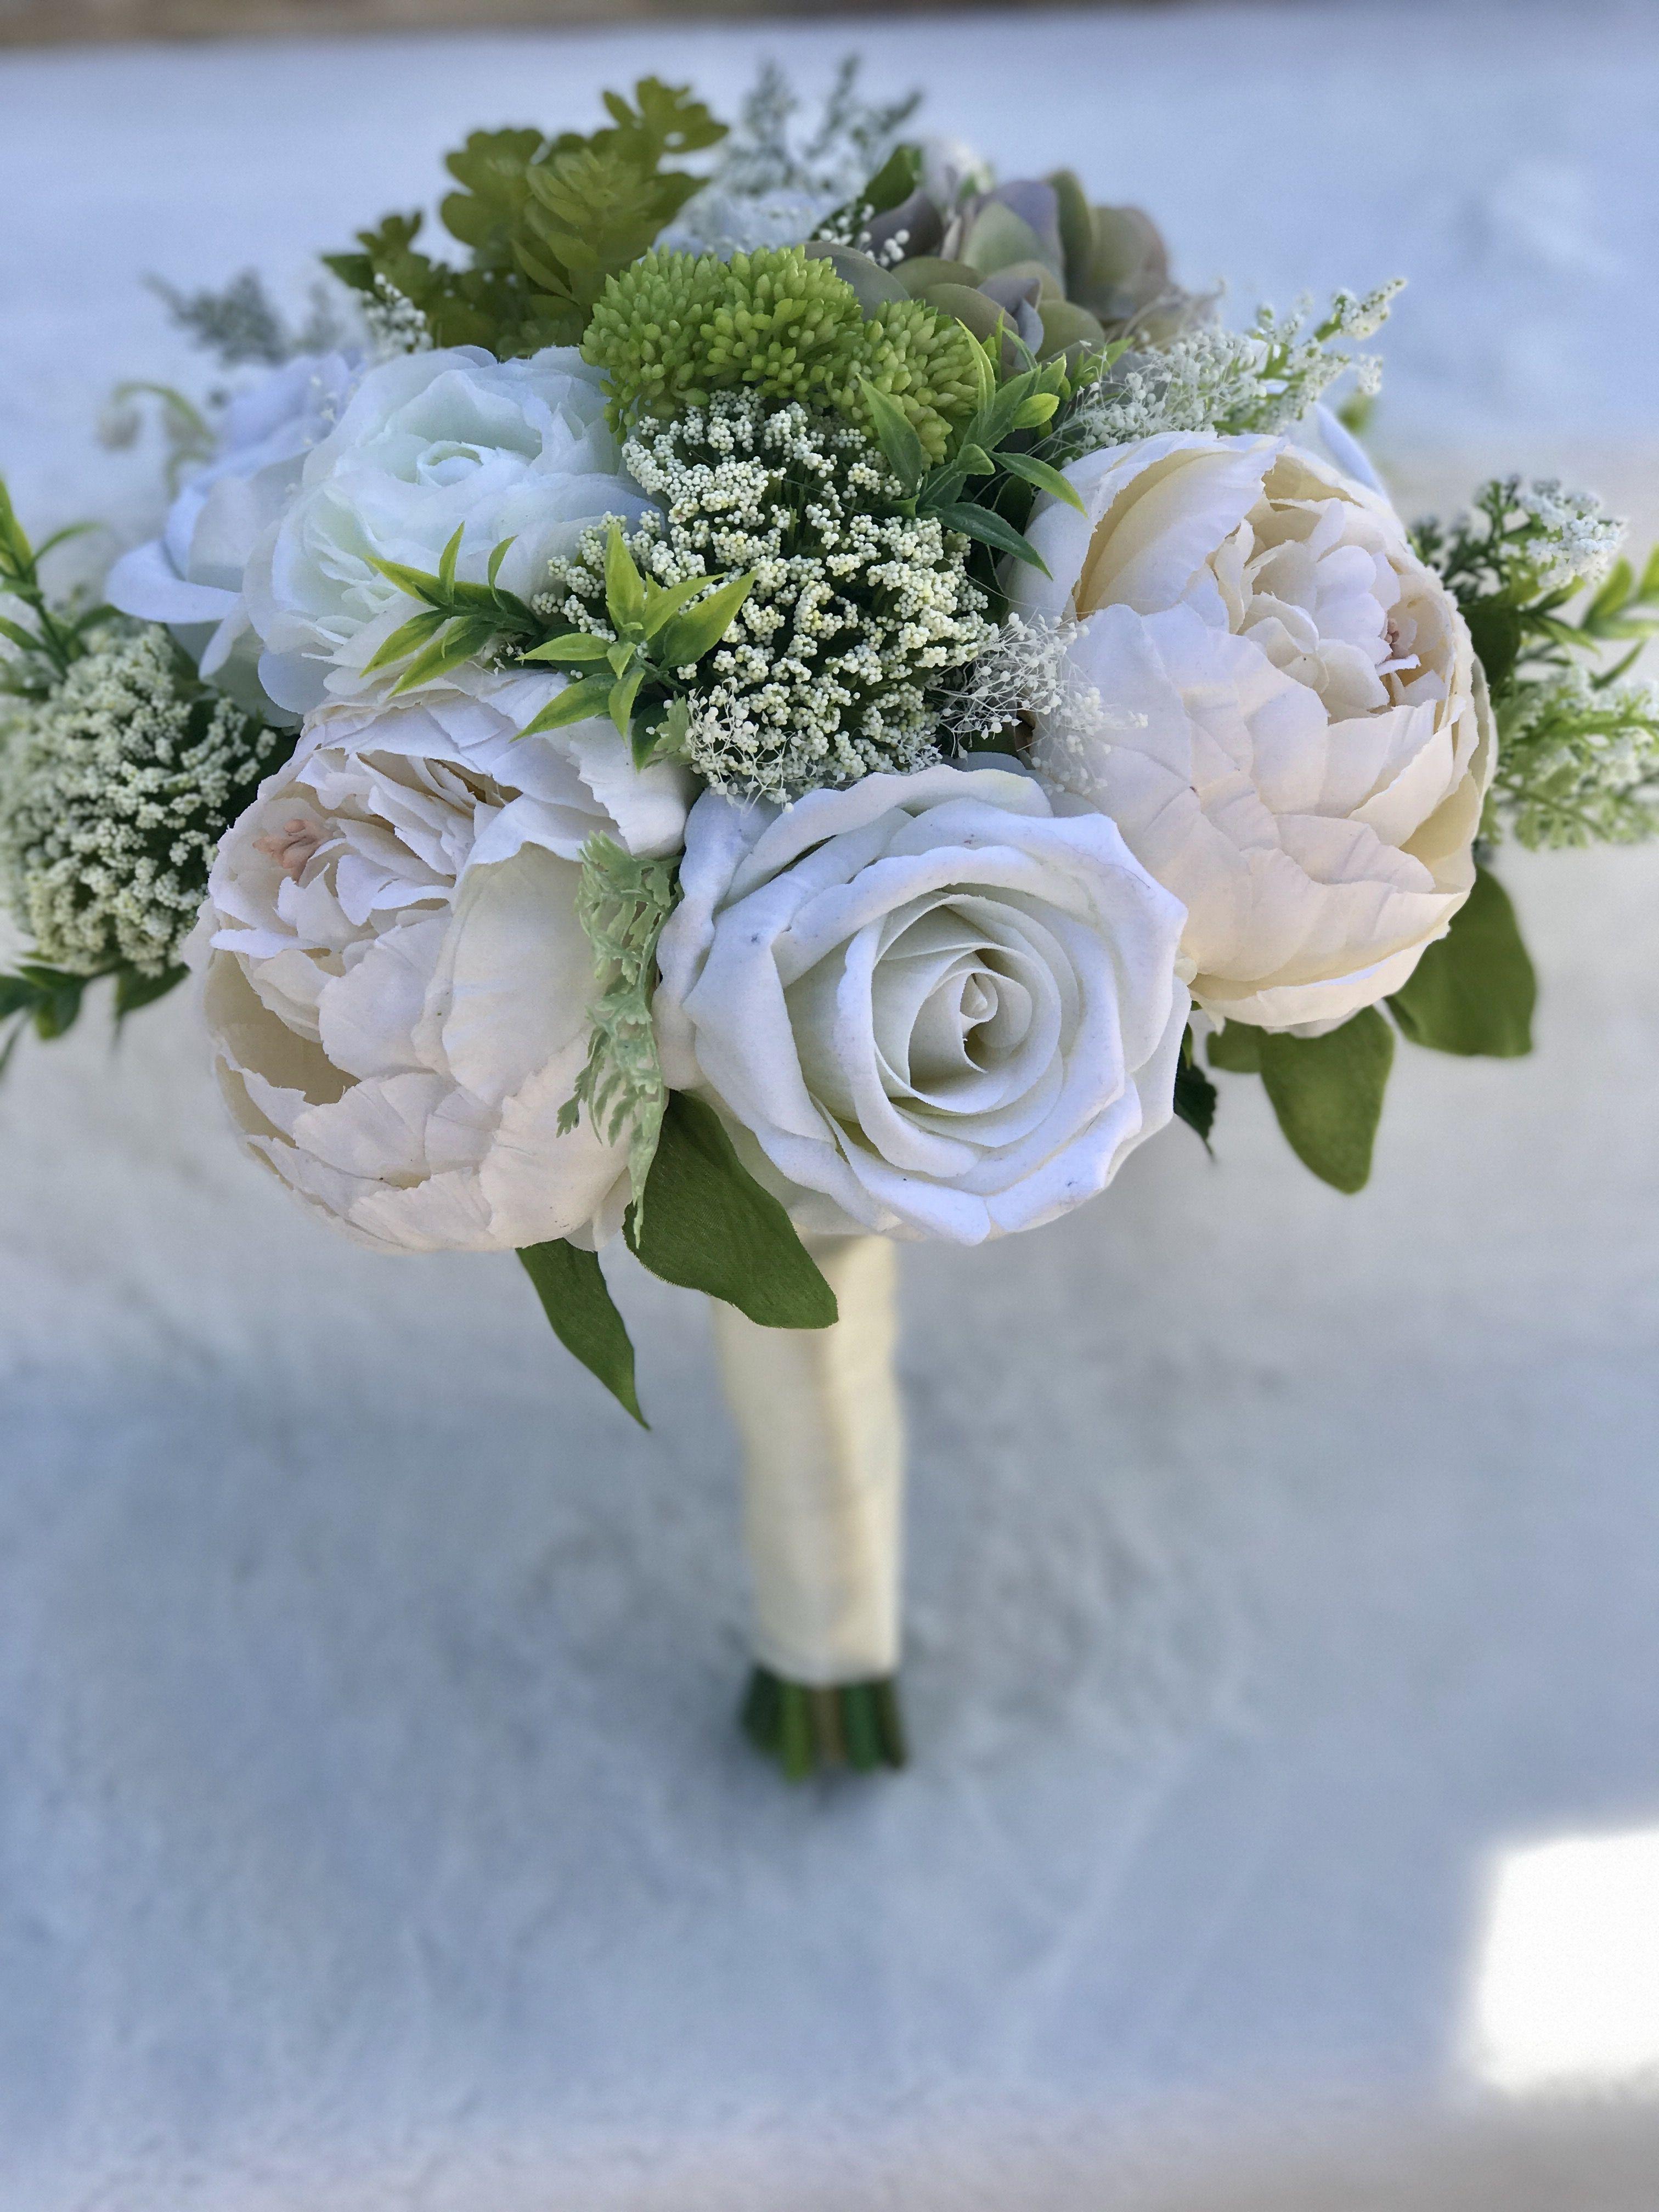 Silk Wild Clutch High Quality Realistic Silks Peonies Roses